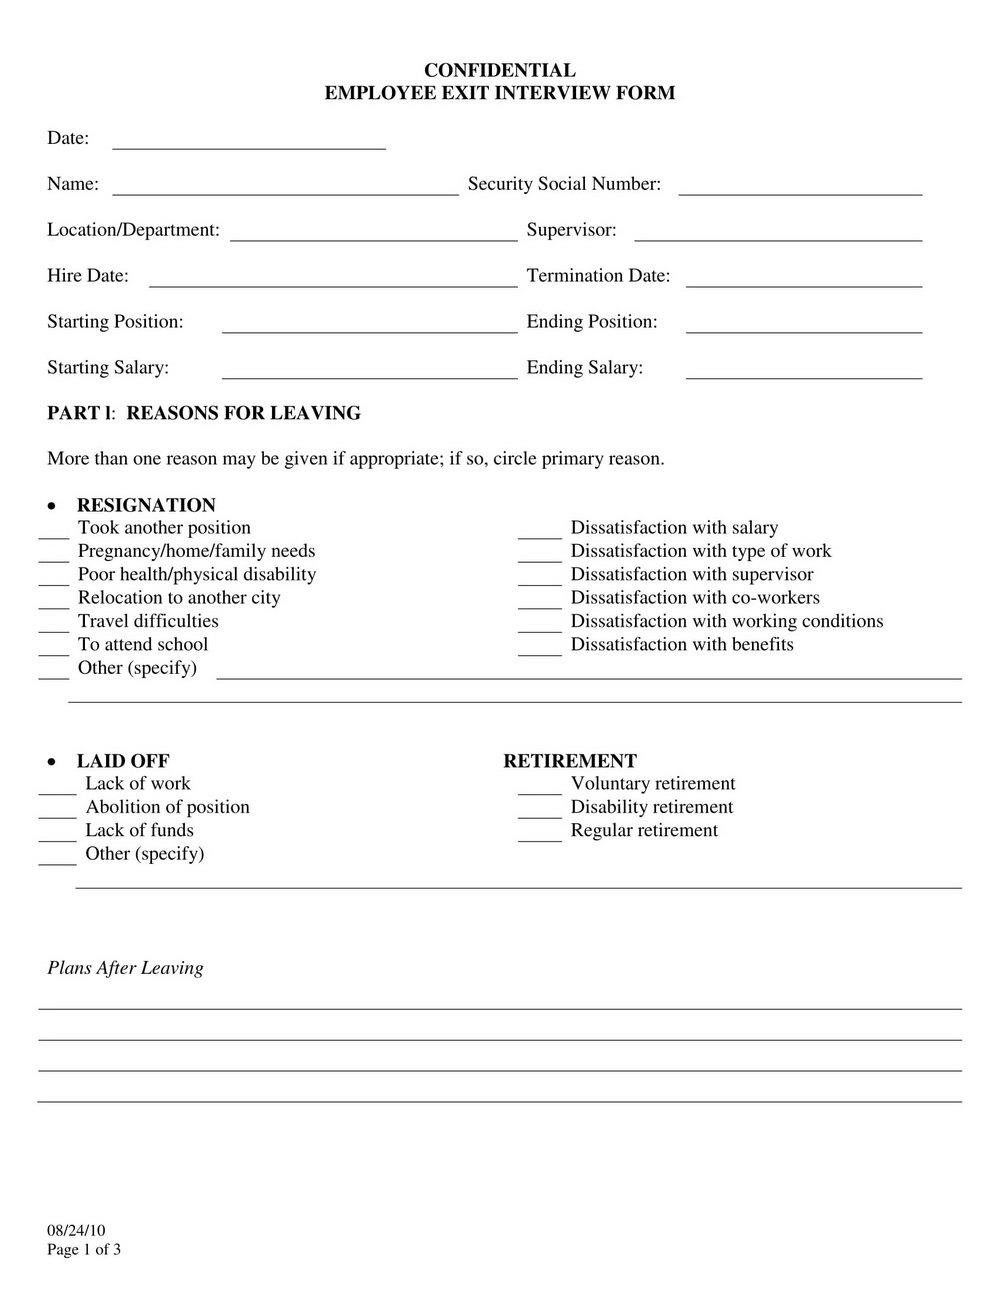 Hr Exit Interview Form